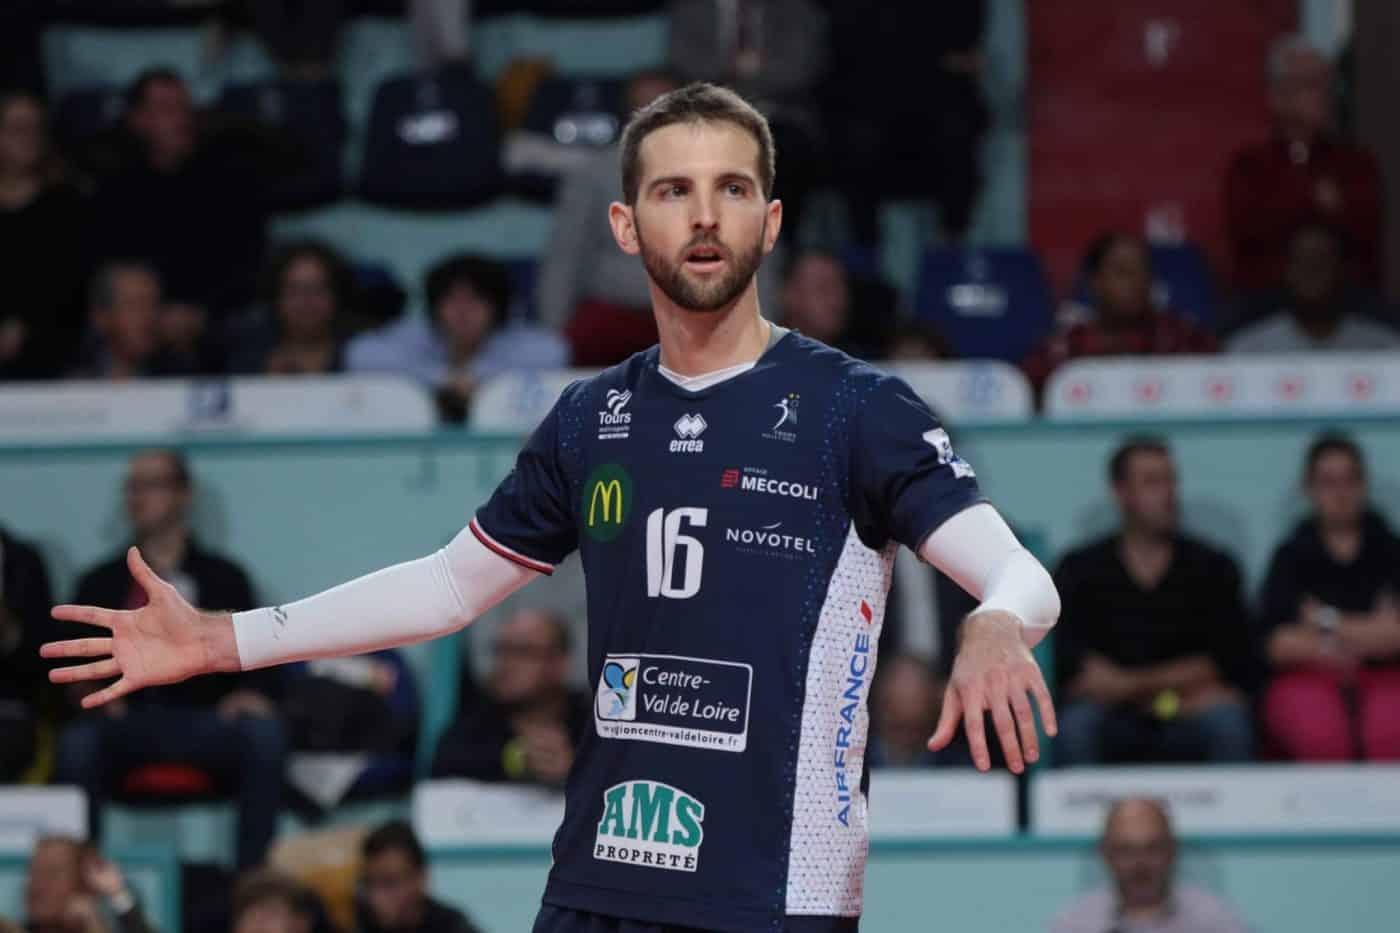 maillot-volley-LAM-2019-2020-tours-errea-4